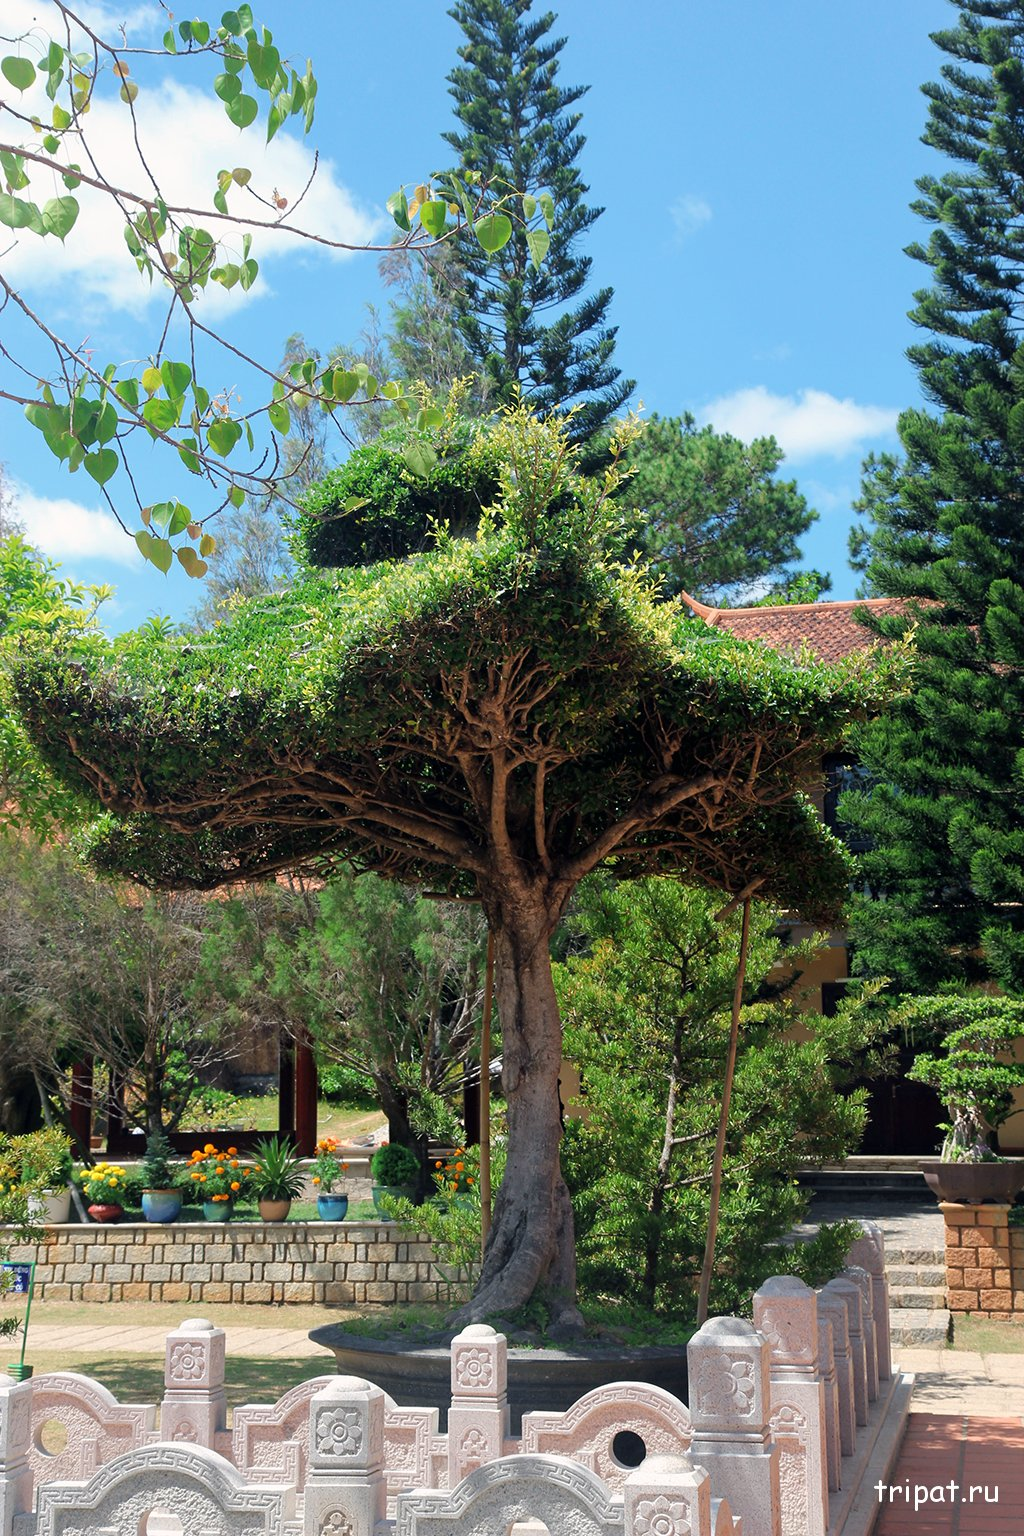 Дерево по форме напоминающее звезду